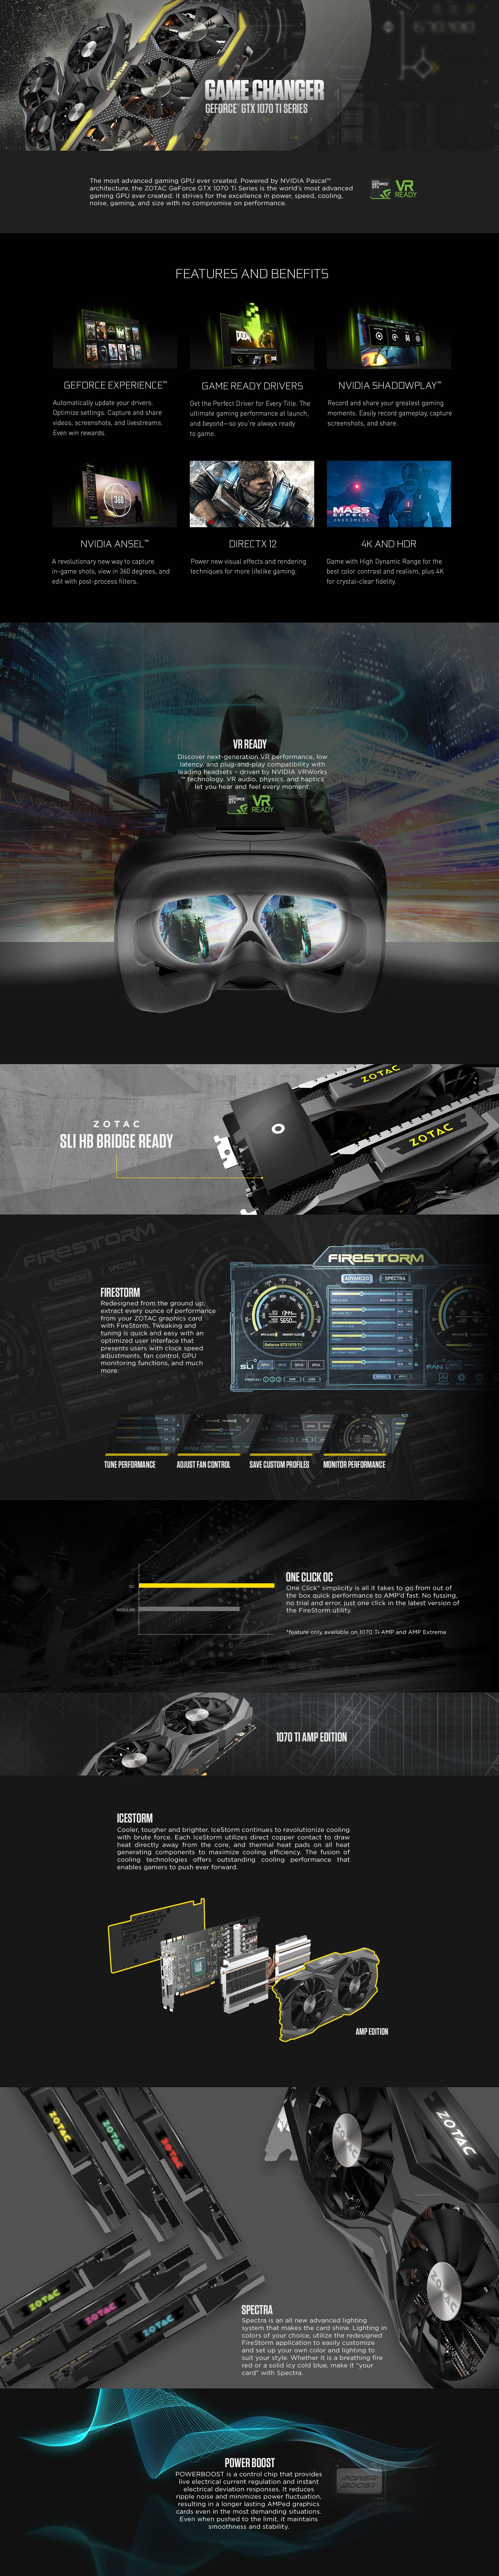 Zotac Geforce Gtx 1070 Ti Amp Edition Asus 8gb Ddr5 Strix Advanced News Blog